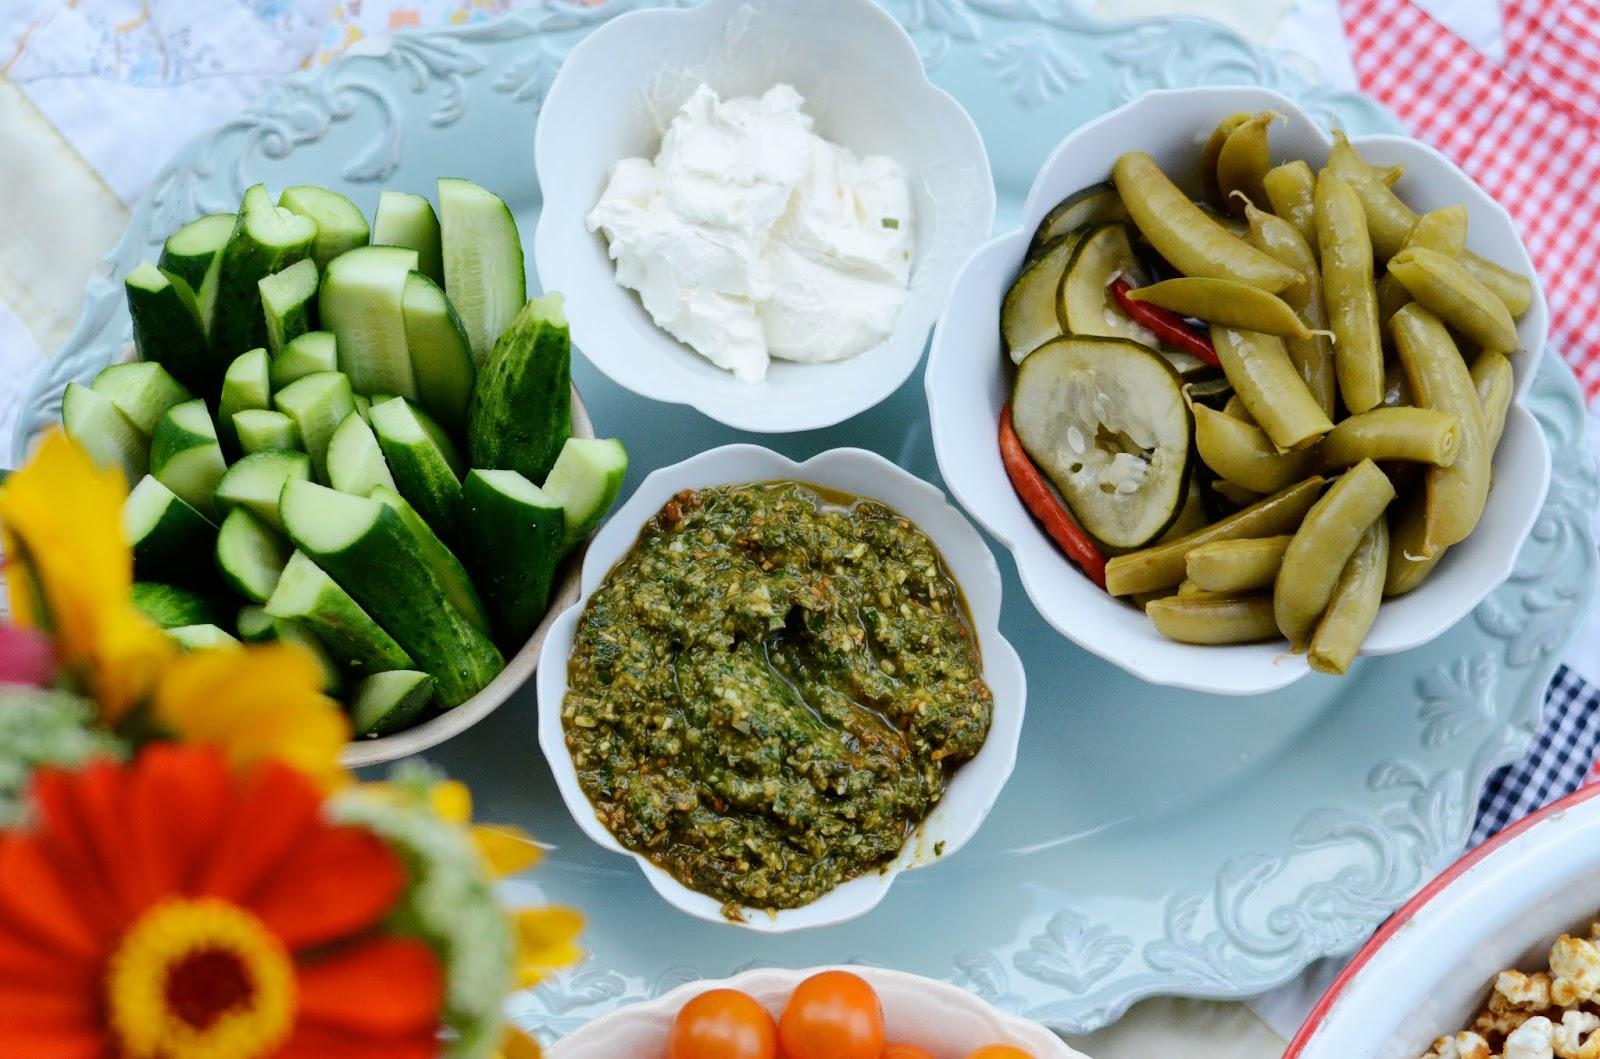 natalie creates: backyard cookouts & fresh party food ideas